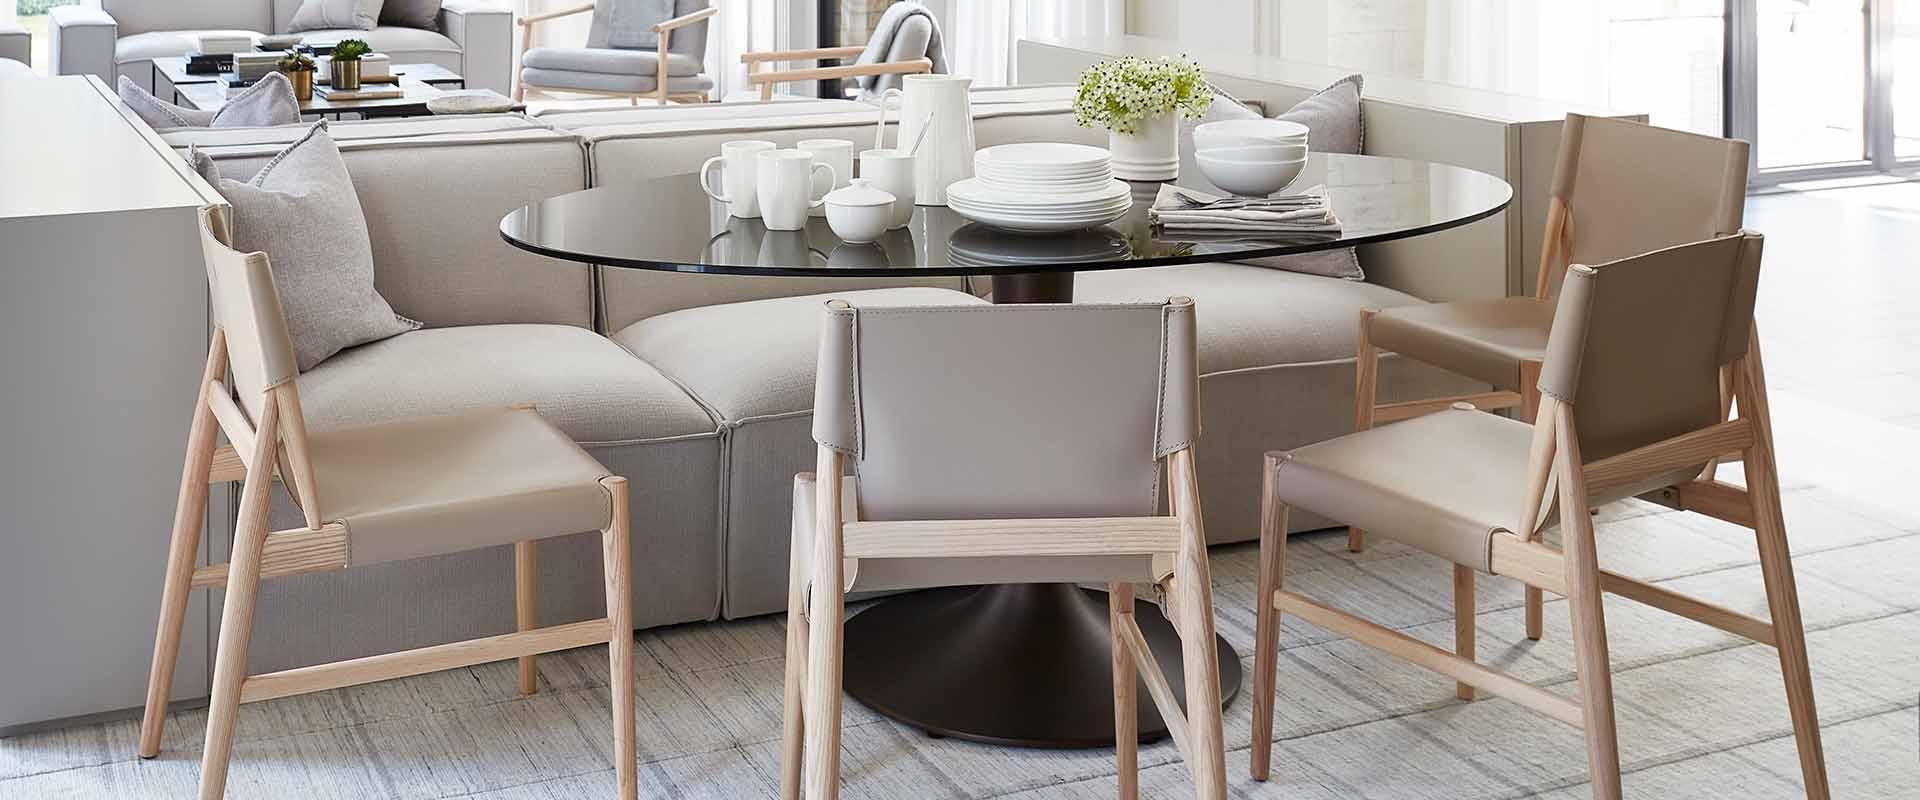 GlucksteinHome   dining furniture